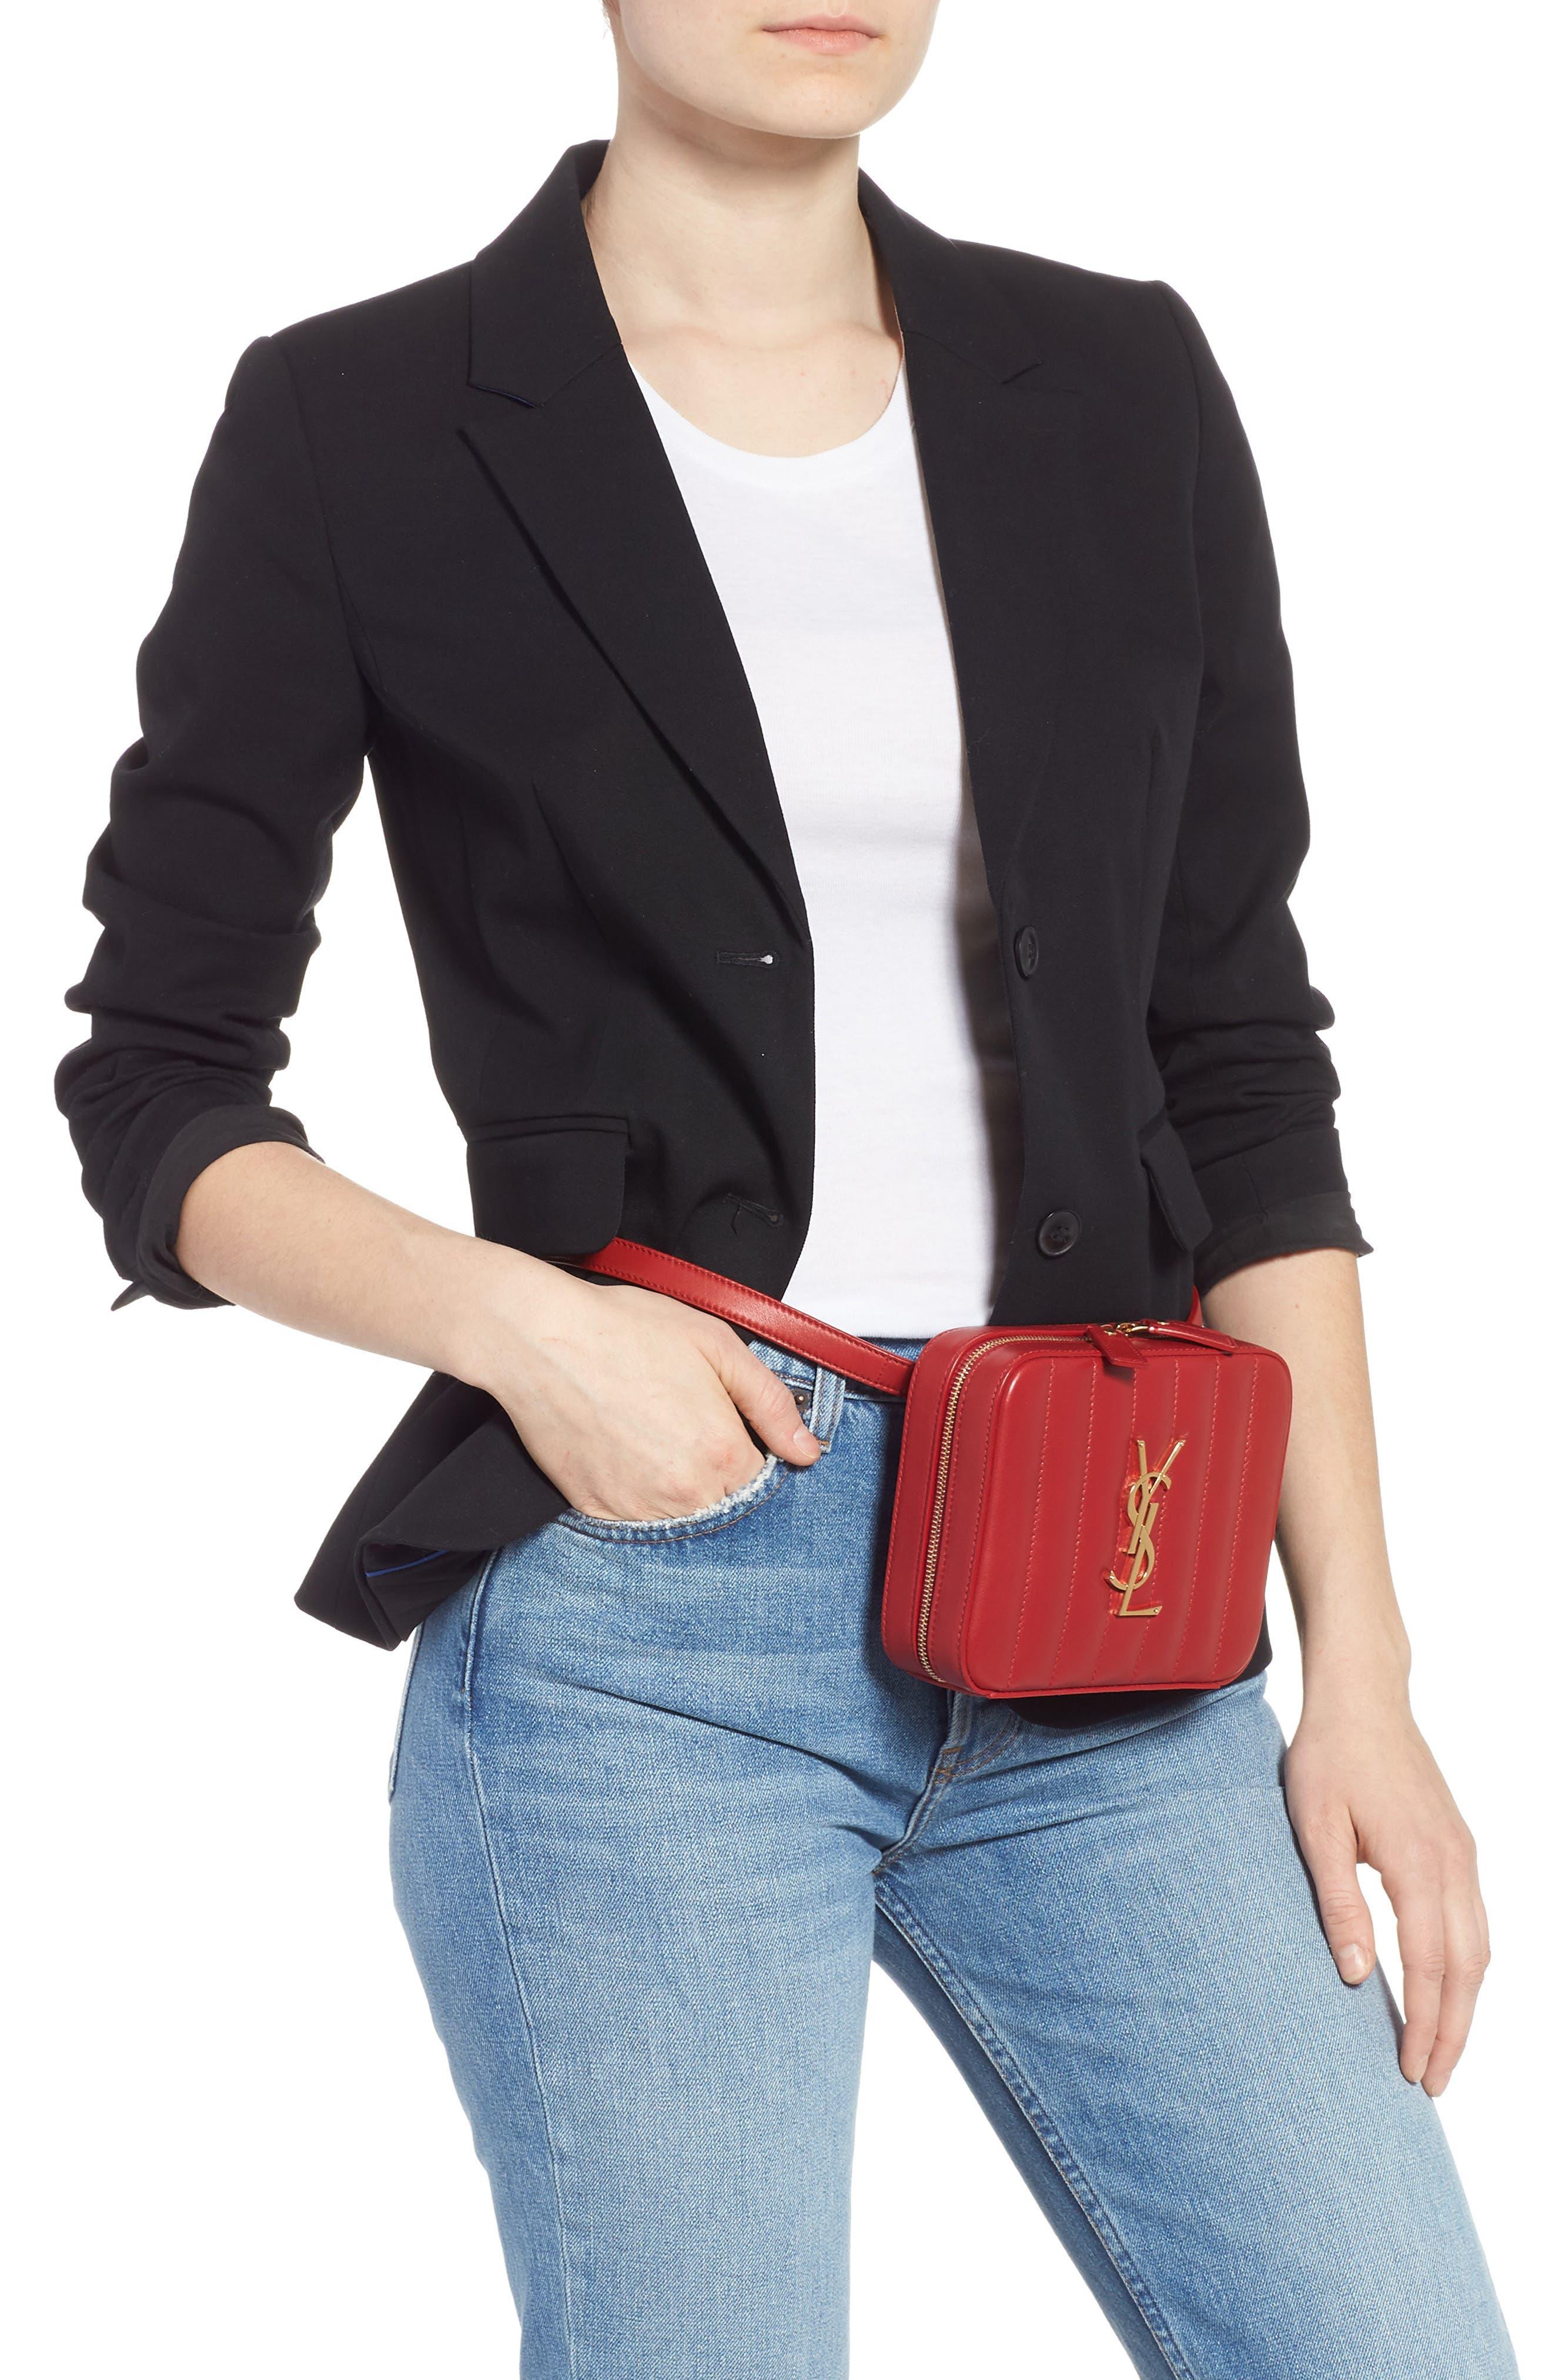 SAINT LAURENT, Vicky Lambskin Leather Belt Bag, Alternate thumbnail 2, color, ROUGE EROS